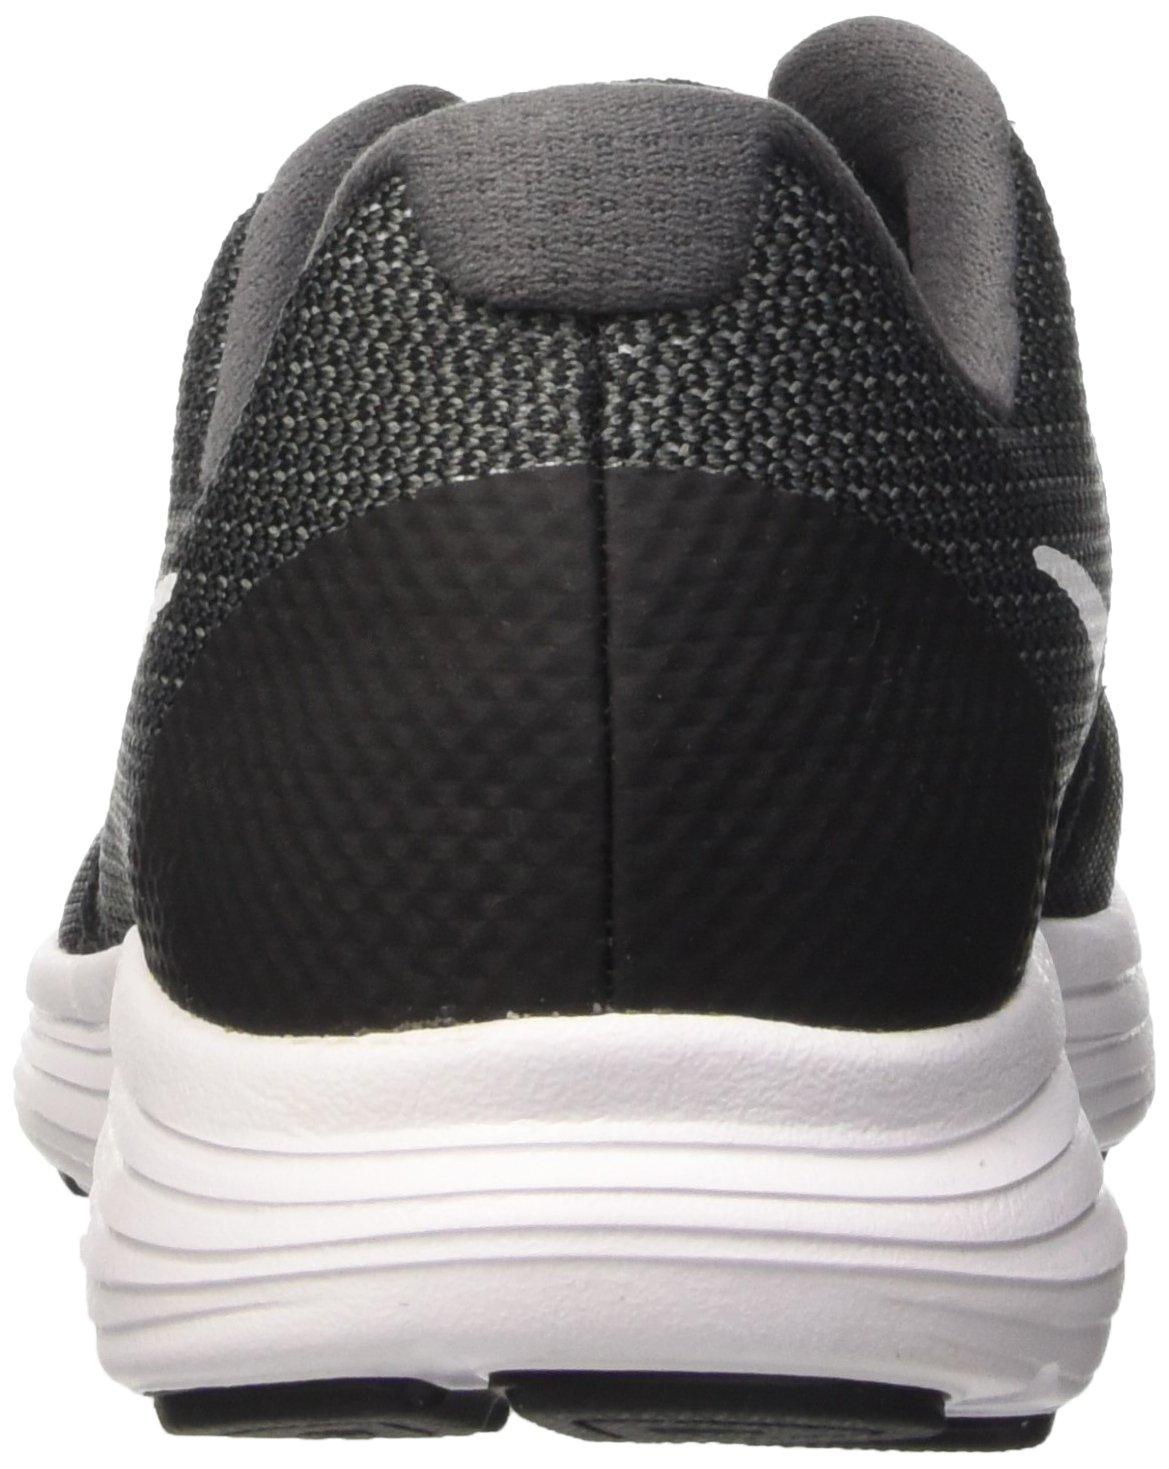 Nike Boys' Revolution 3 (GS) Running Shoe Dark Grey/White/Black/Pure Platinum 3.5 M US Big Kid by Nike (Image #2)